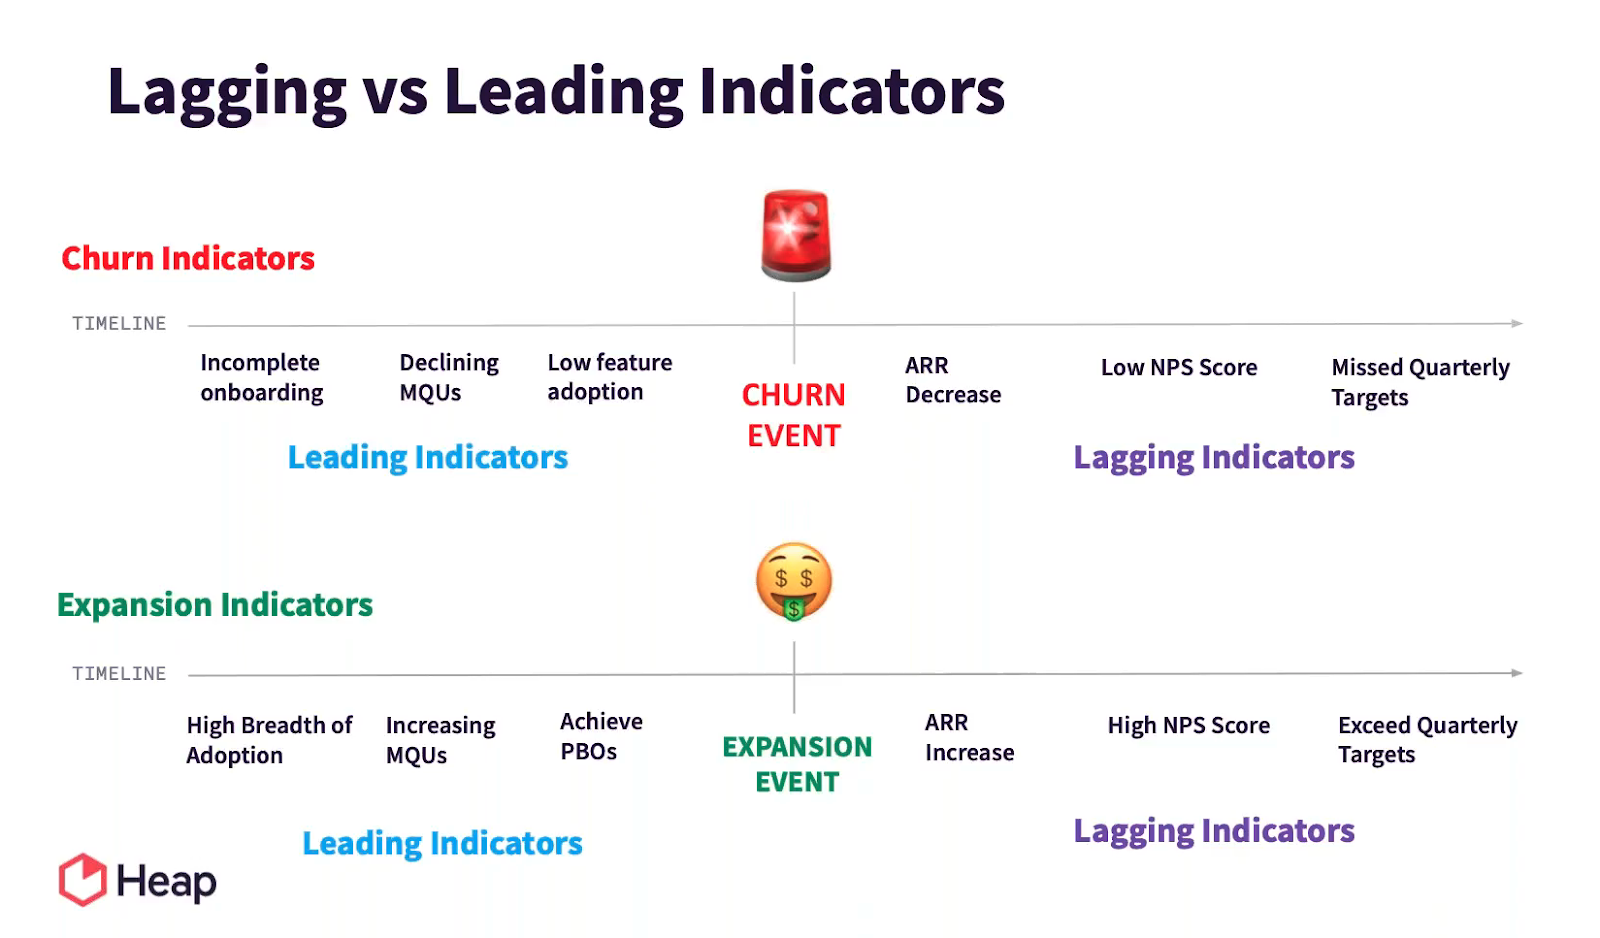 Customer Success Leading Indicators Vs. Lagging Indicators